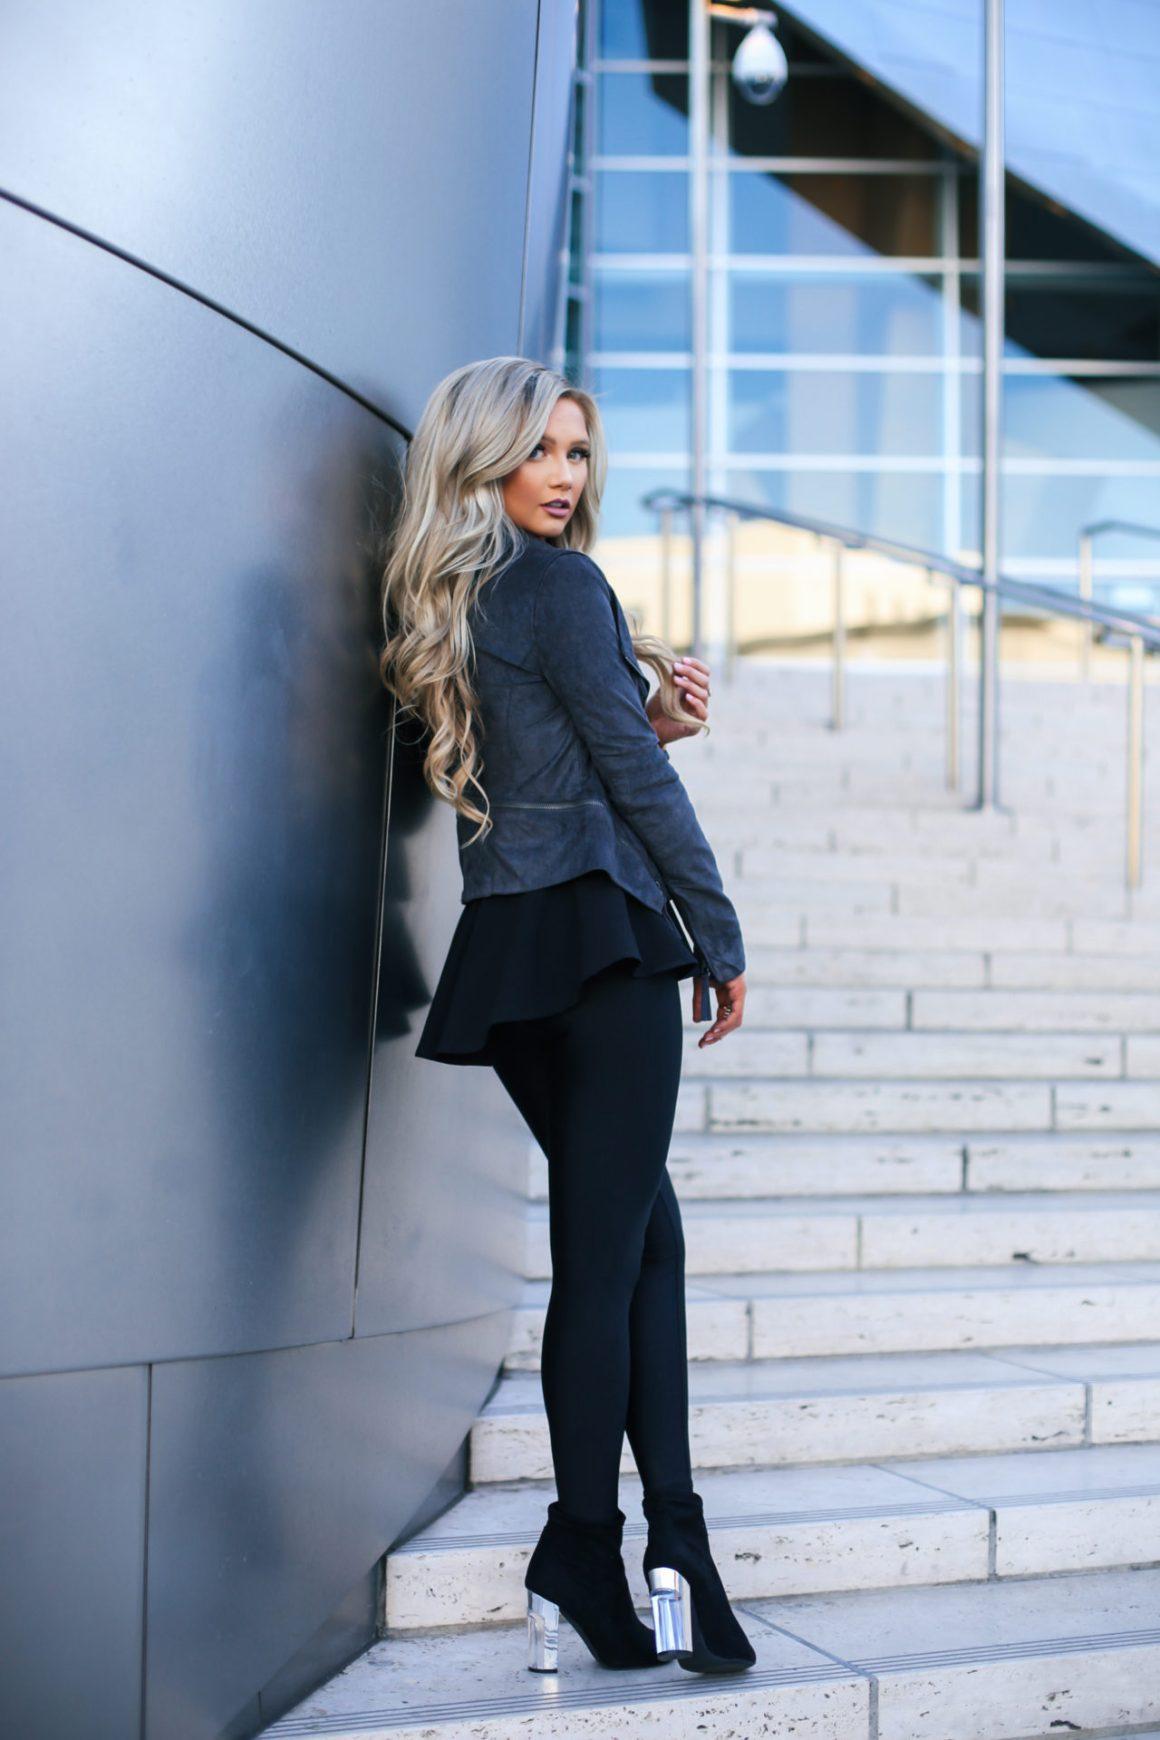 Black-Peplum-leggings-stephanie-danielle-thecityblonde-ryanbyryanchua-4695